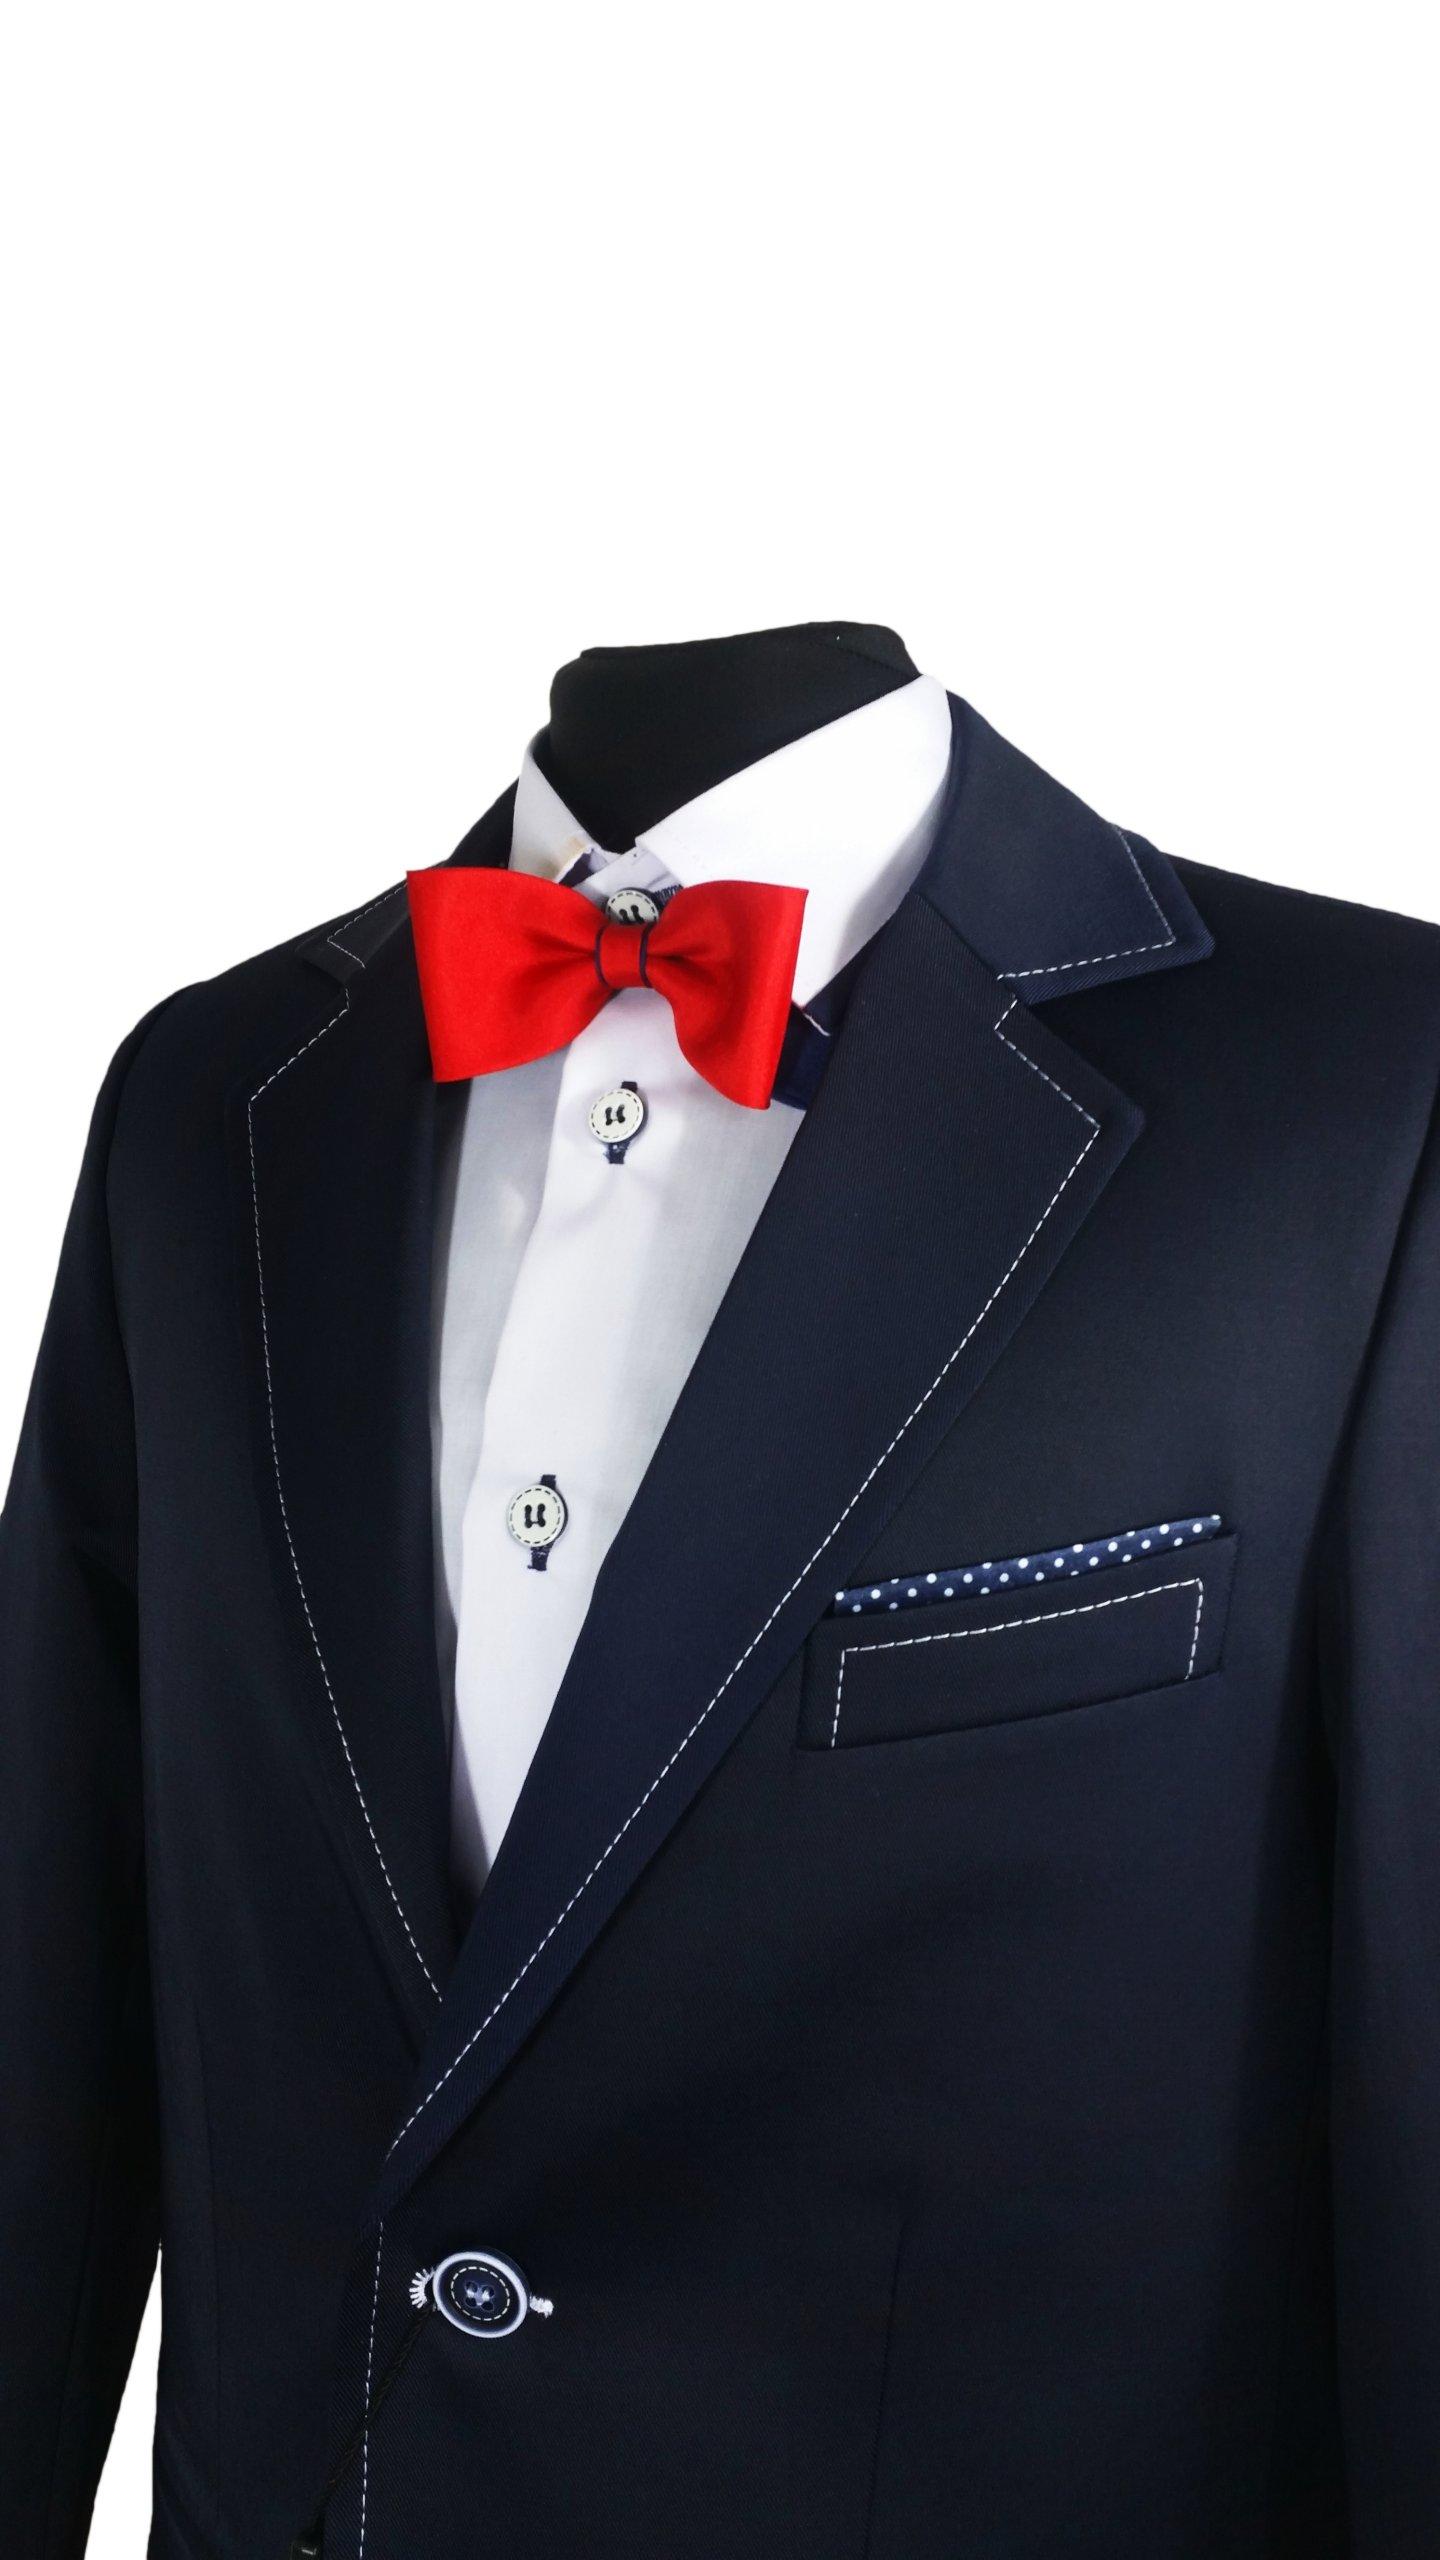 090575cea4 Elegancki garnitur chłopięcy JANKES 152 - 7268043251 - oficjalne archiwum  allegro